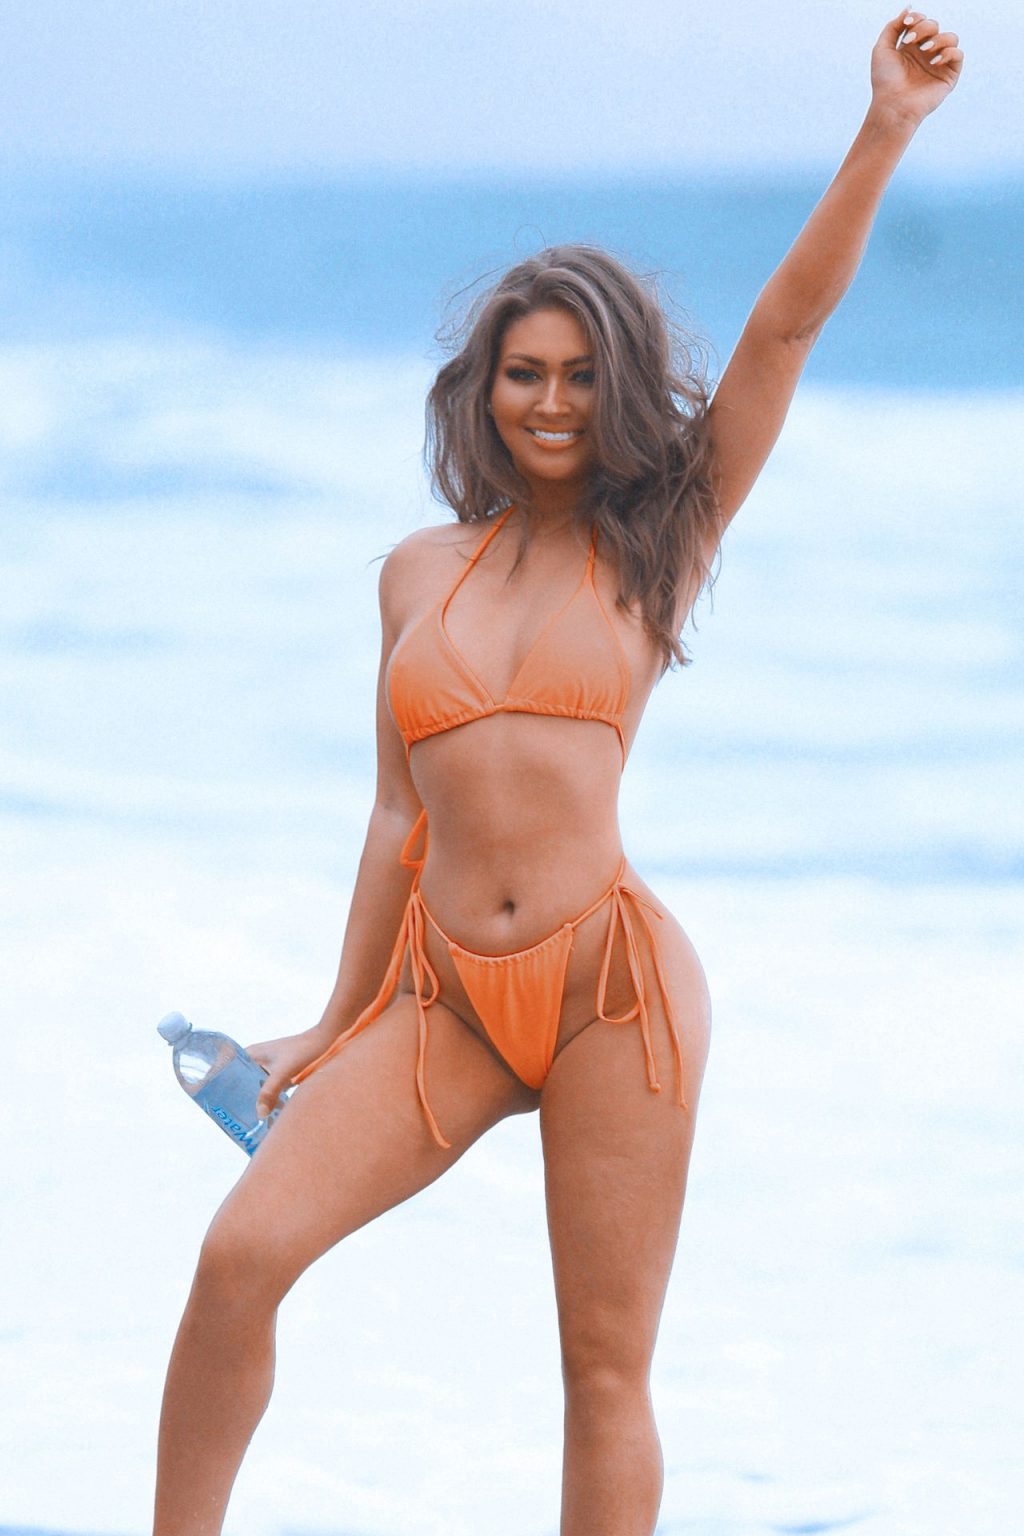 Paula Kalini Shows Off Her Curvy Beach Body in a Photoshoot in Malibu (48 Photos)